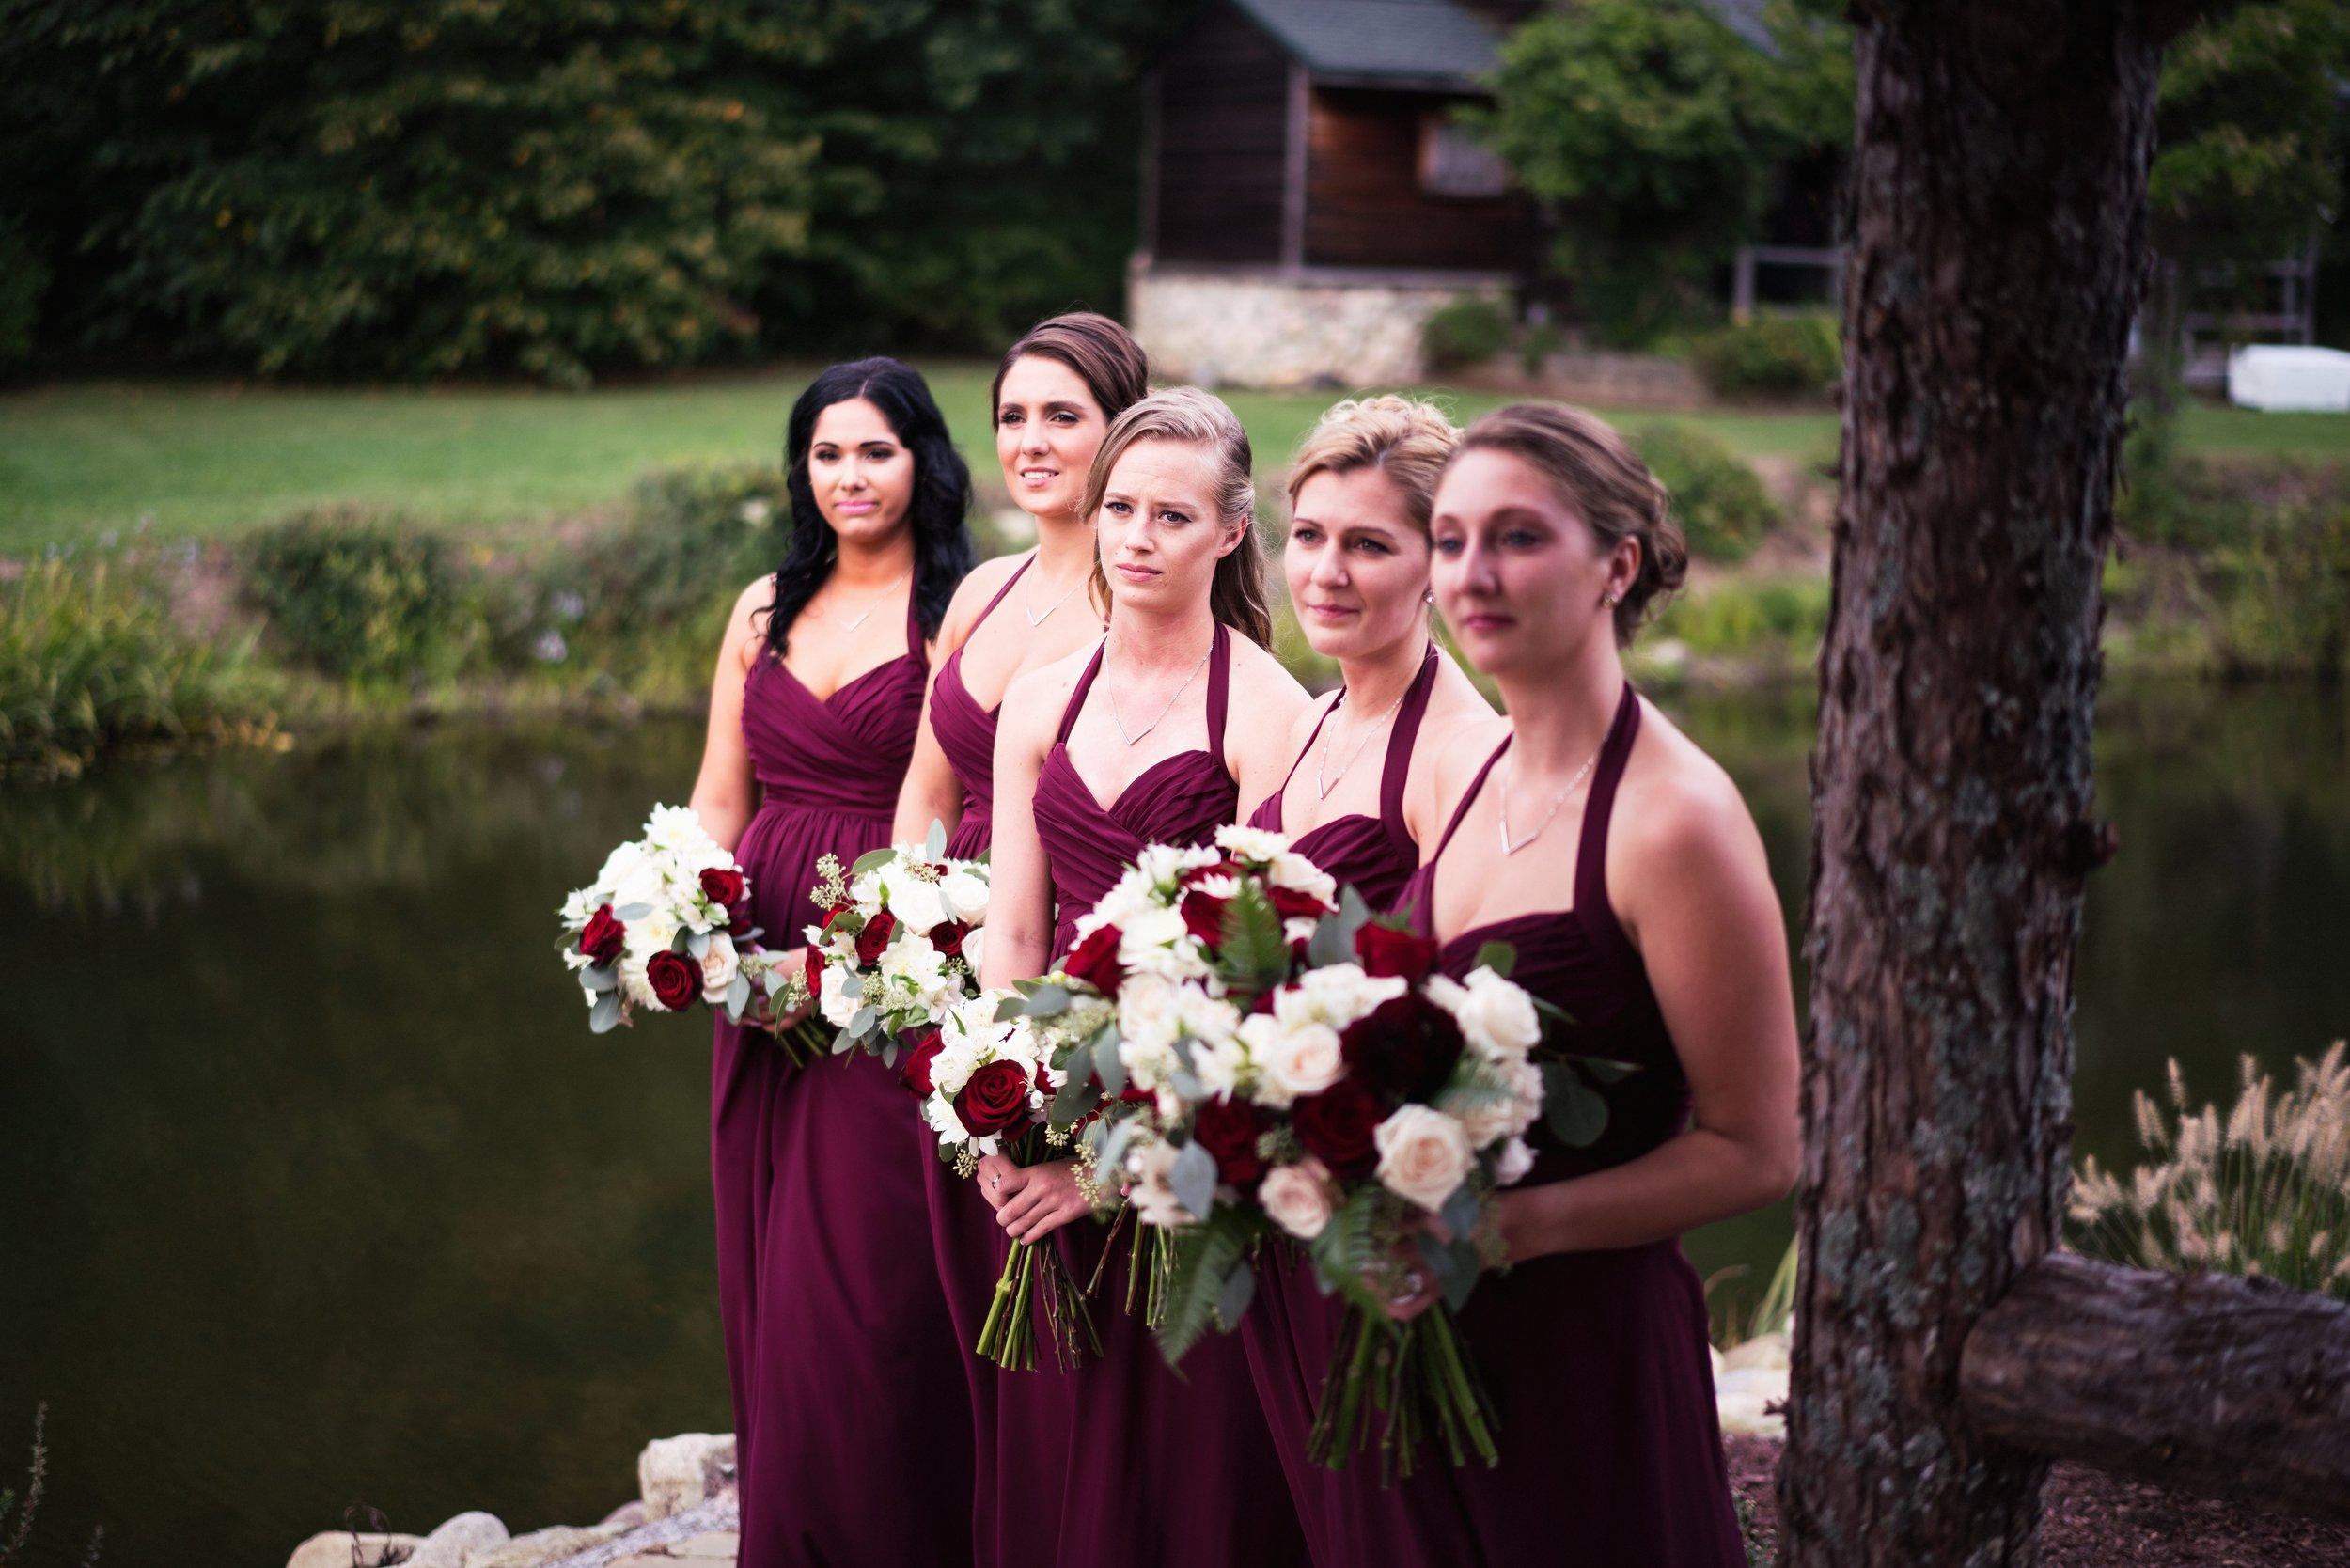 Blog-Lisa-James-Wedding-at Rosebud Estate Weddings in Arcade NY by Stefan-Ludwig-Photography-Buffalo-NY-46-x.jpg